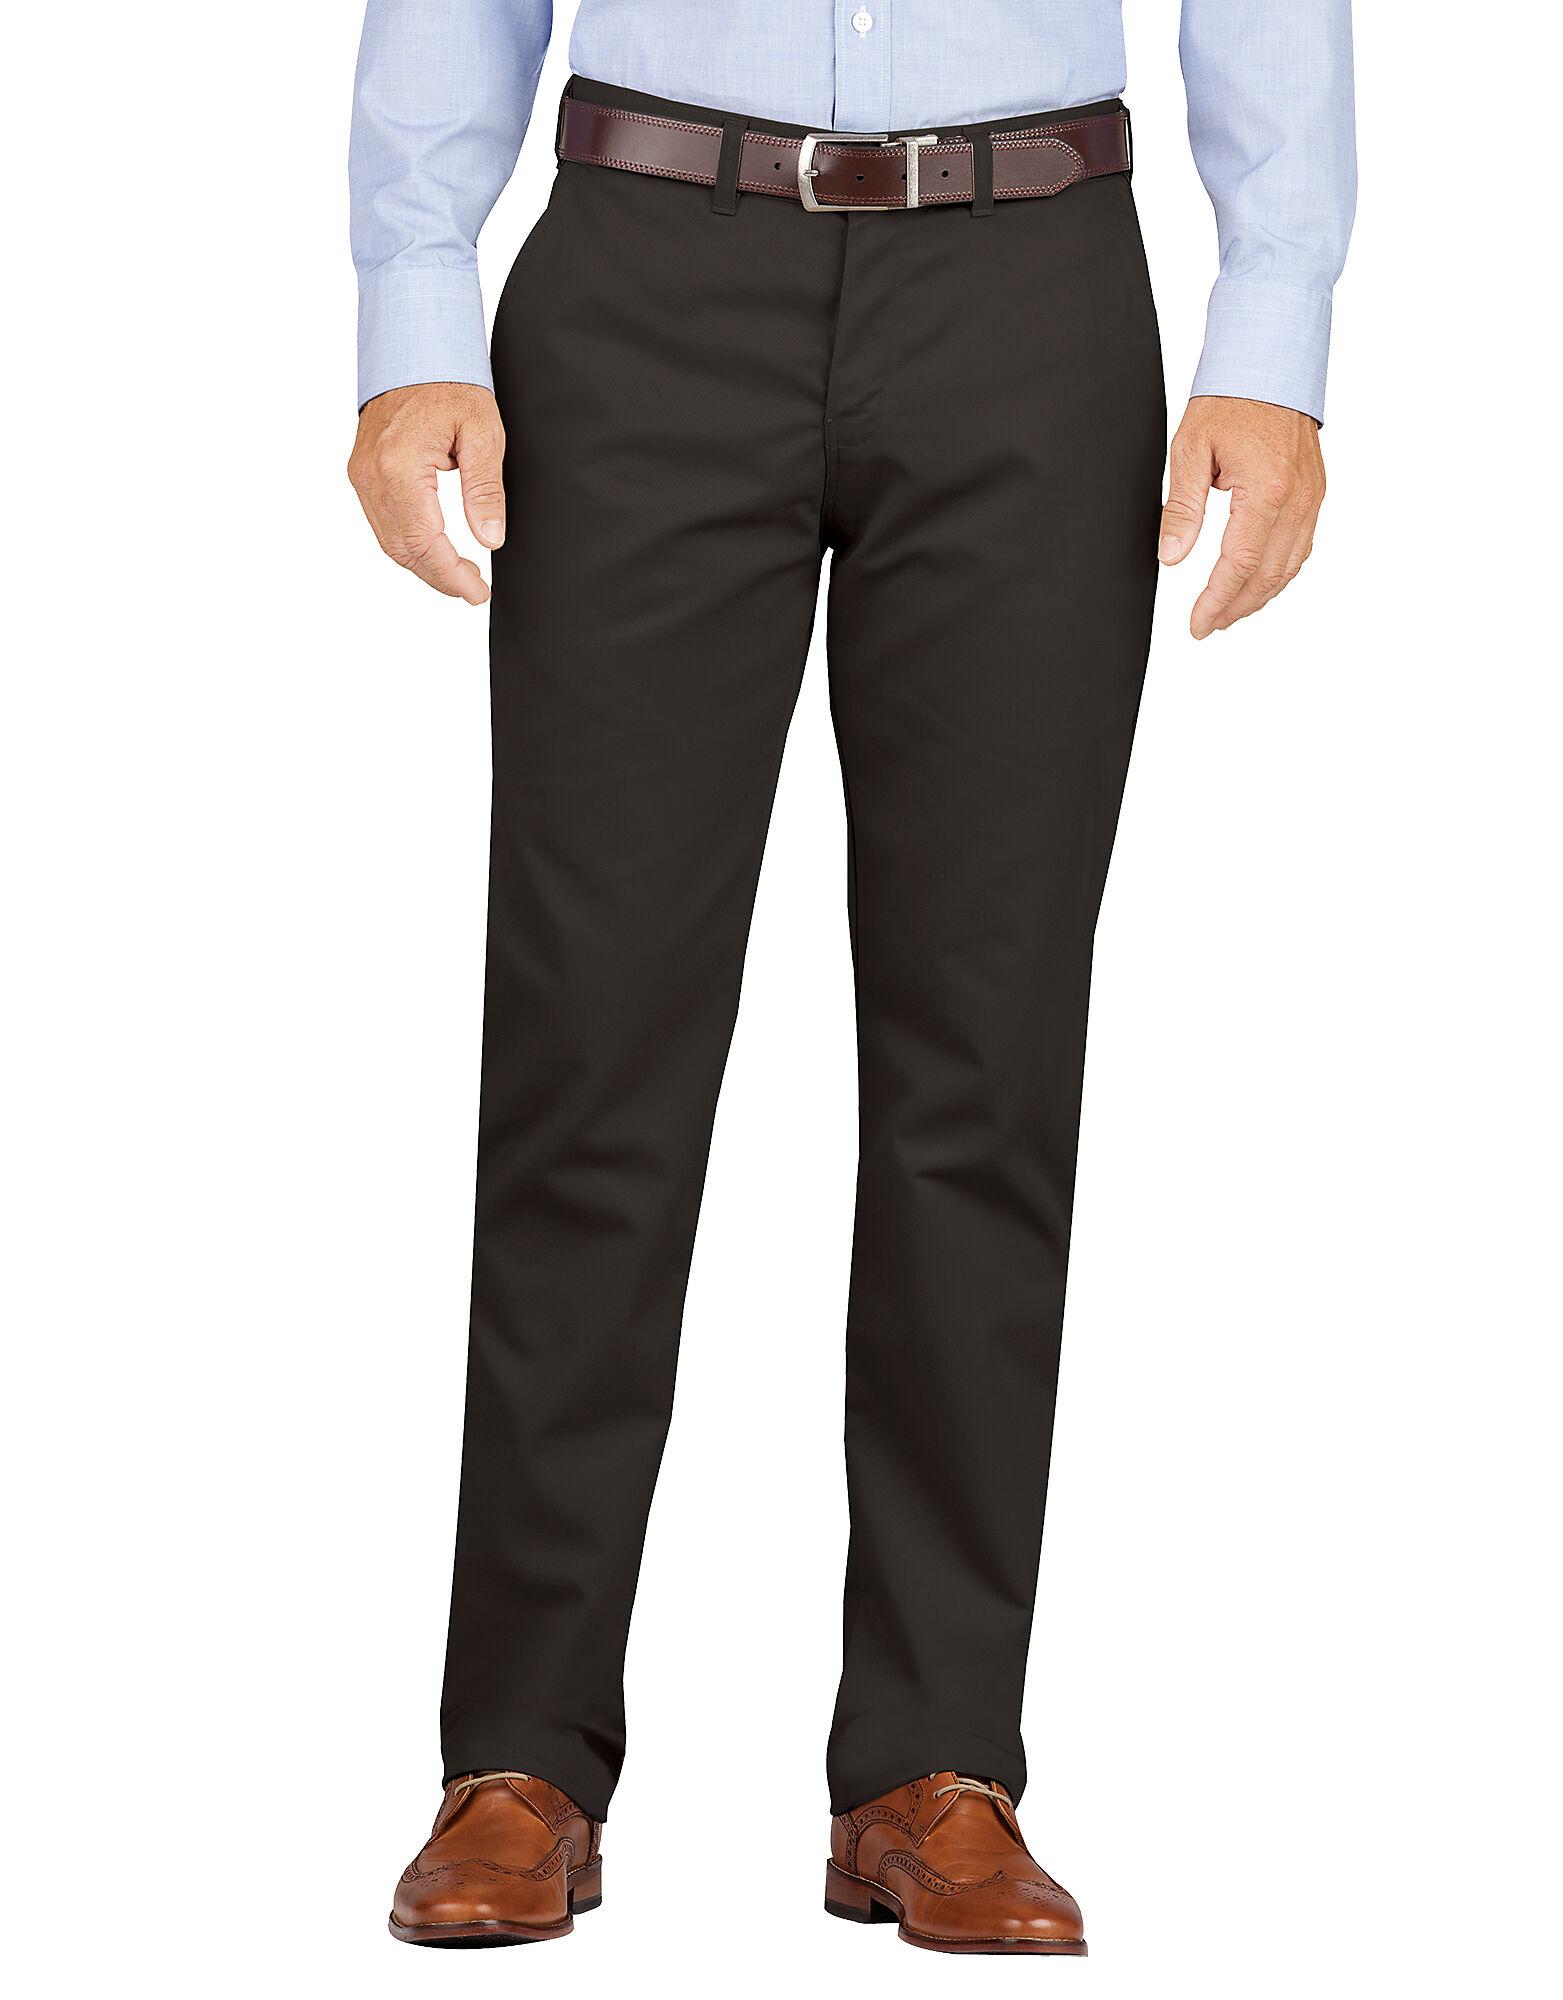 Khaki Dress Pants For Men | Slit Fit & Tapered Leg | Dickies